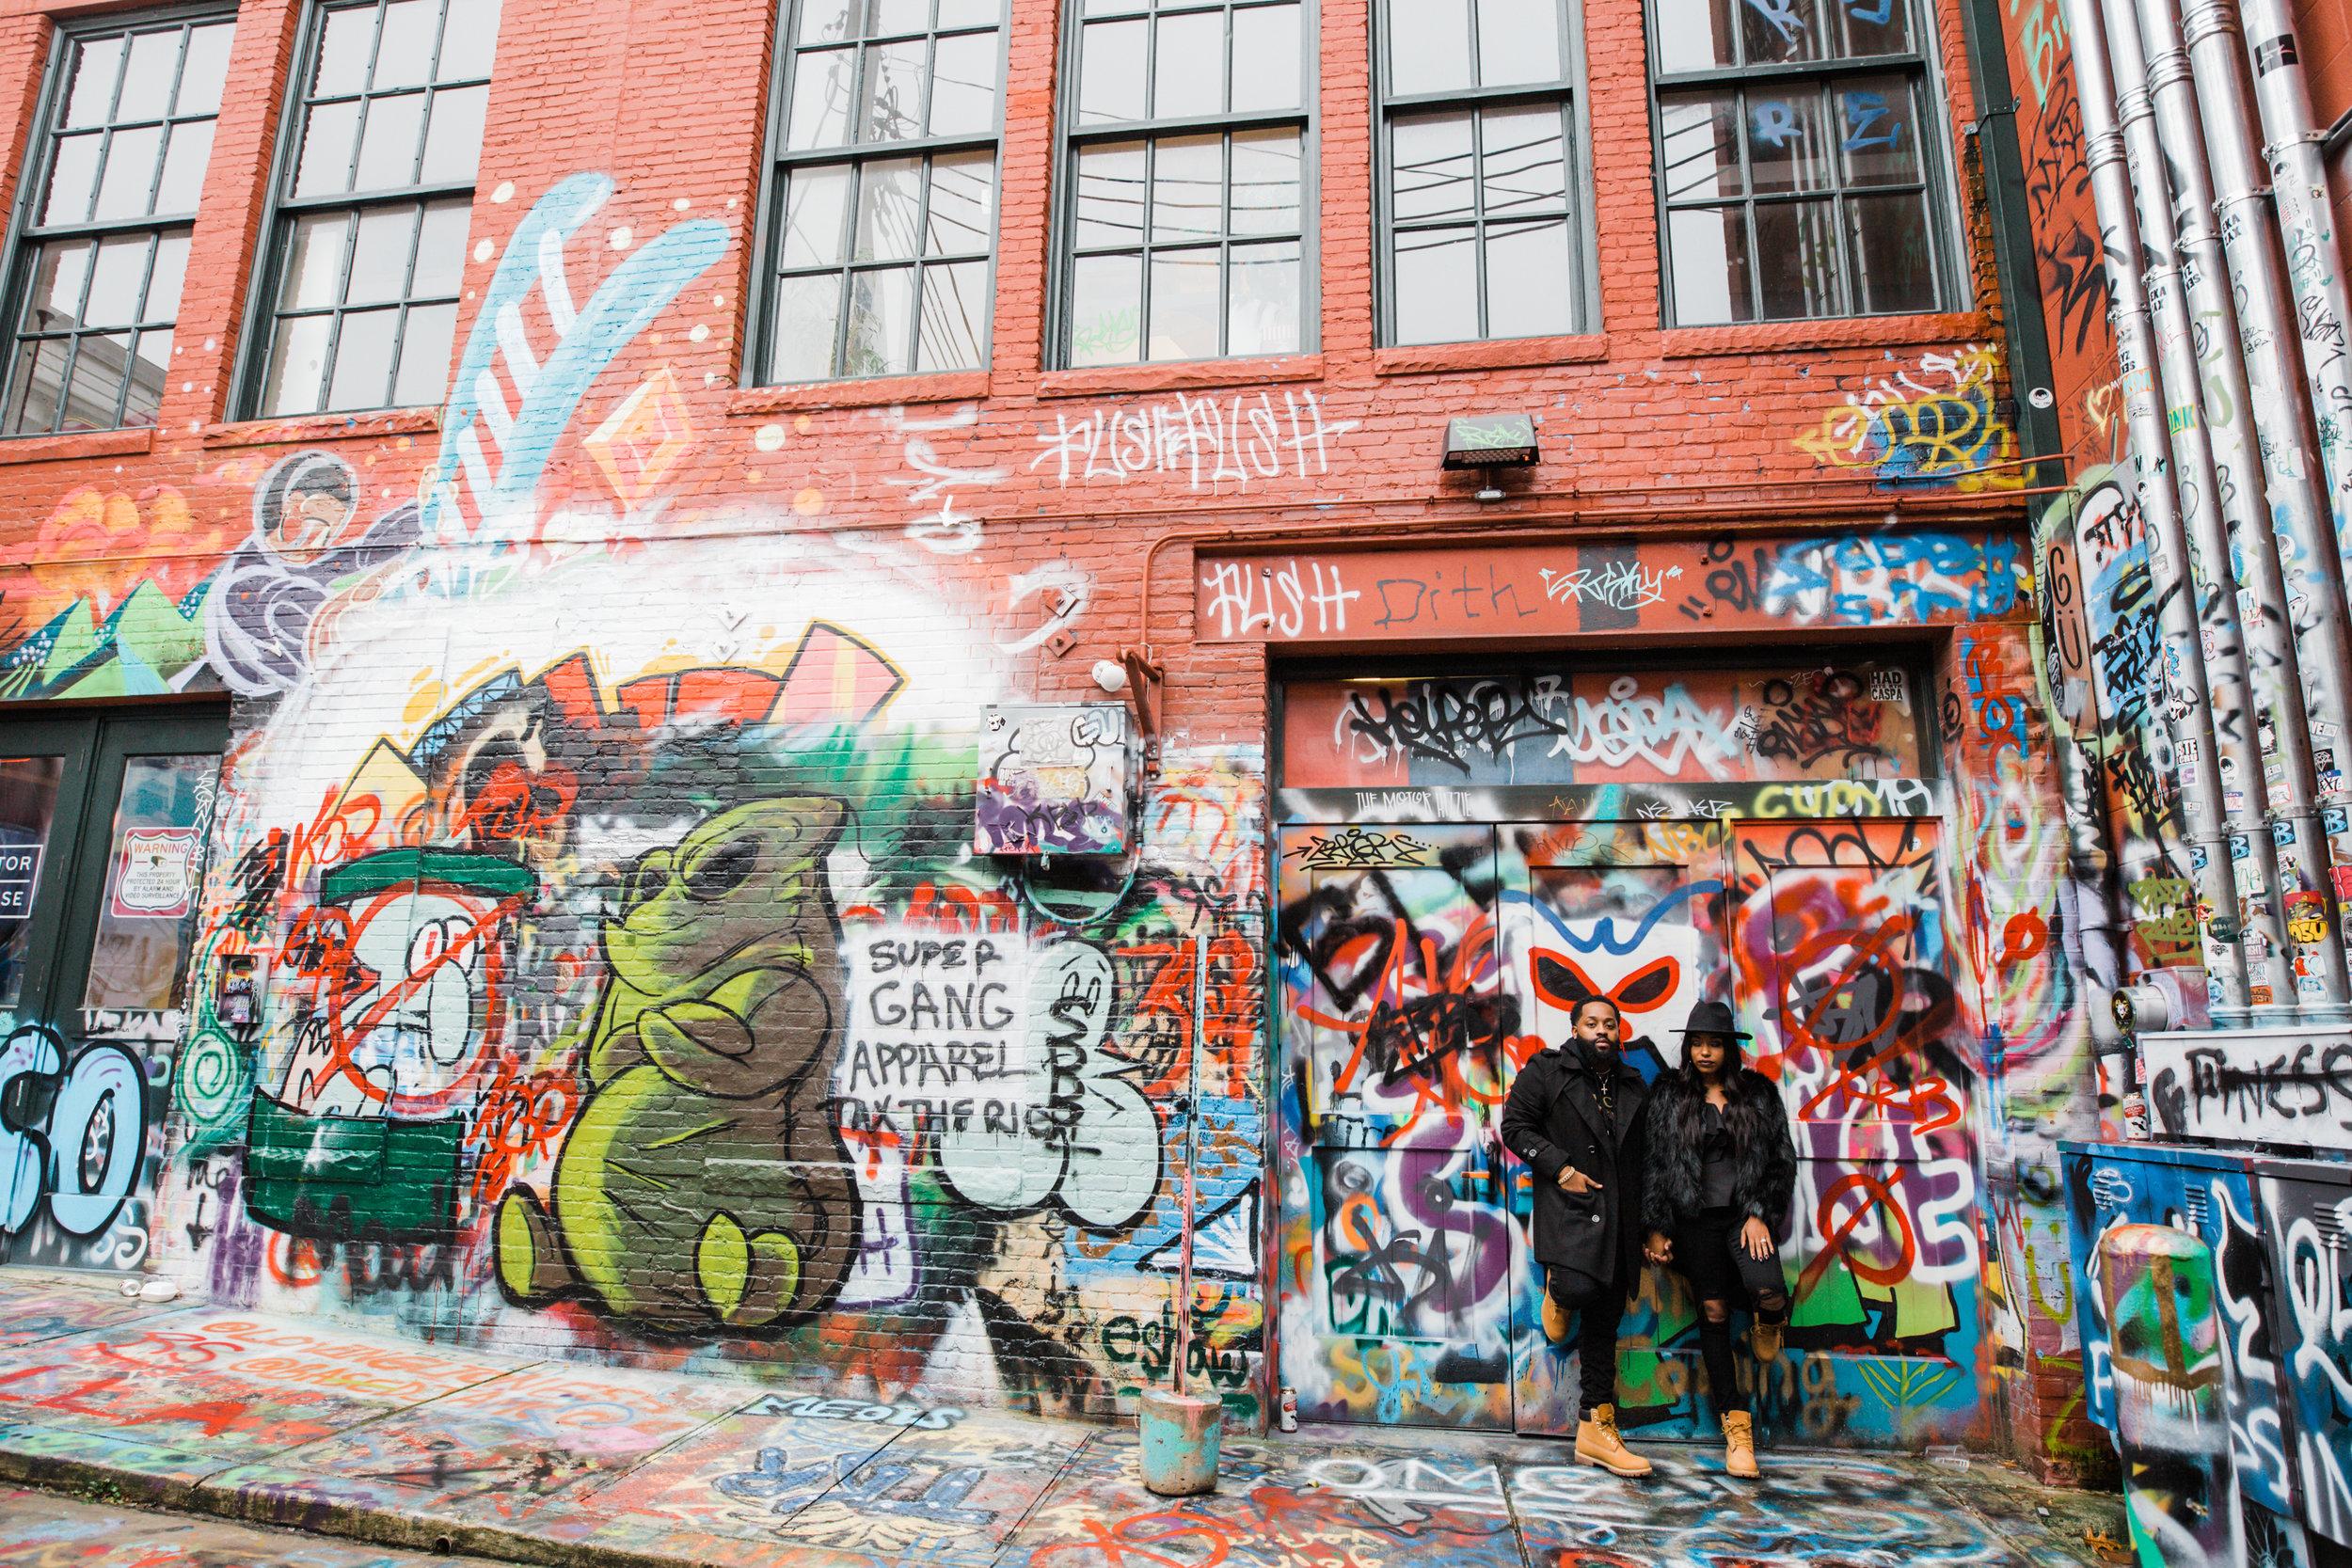 Creative Baltimore Graffiti Alley Engagement Session Megapixels Media Photography-16.jpg